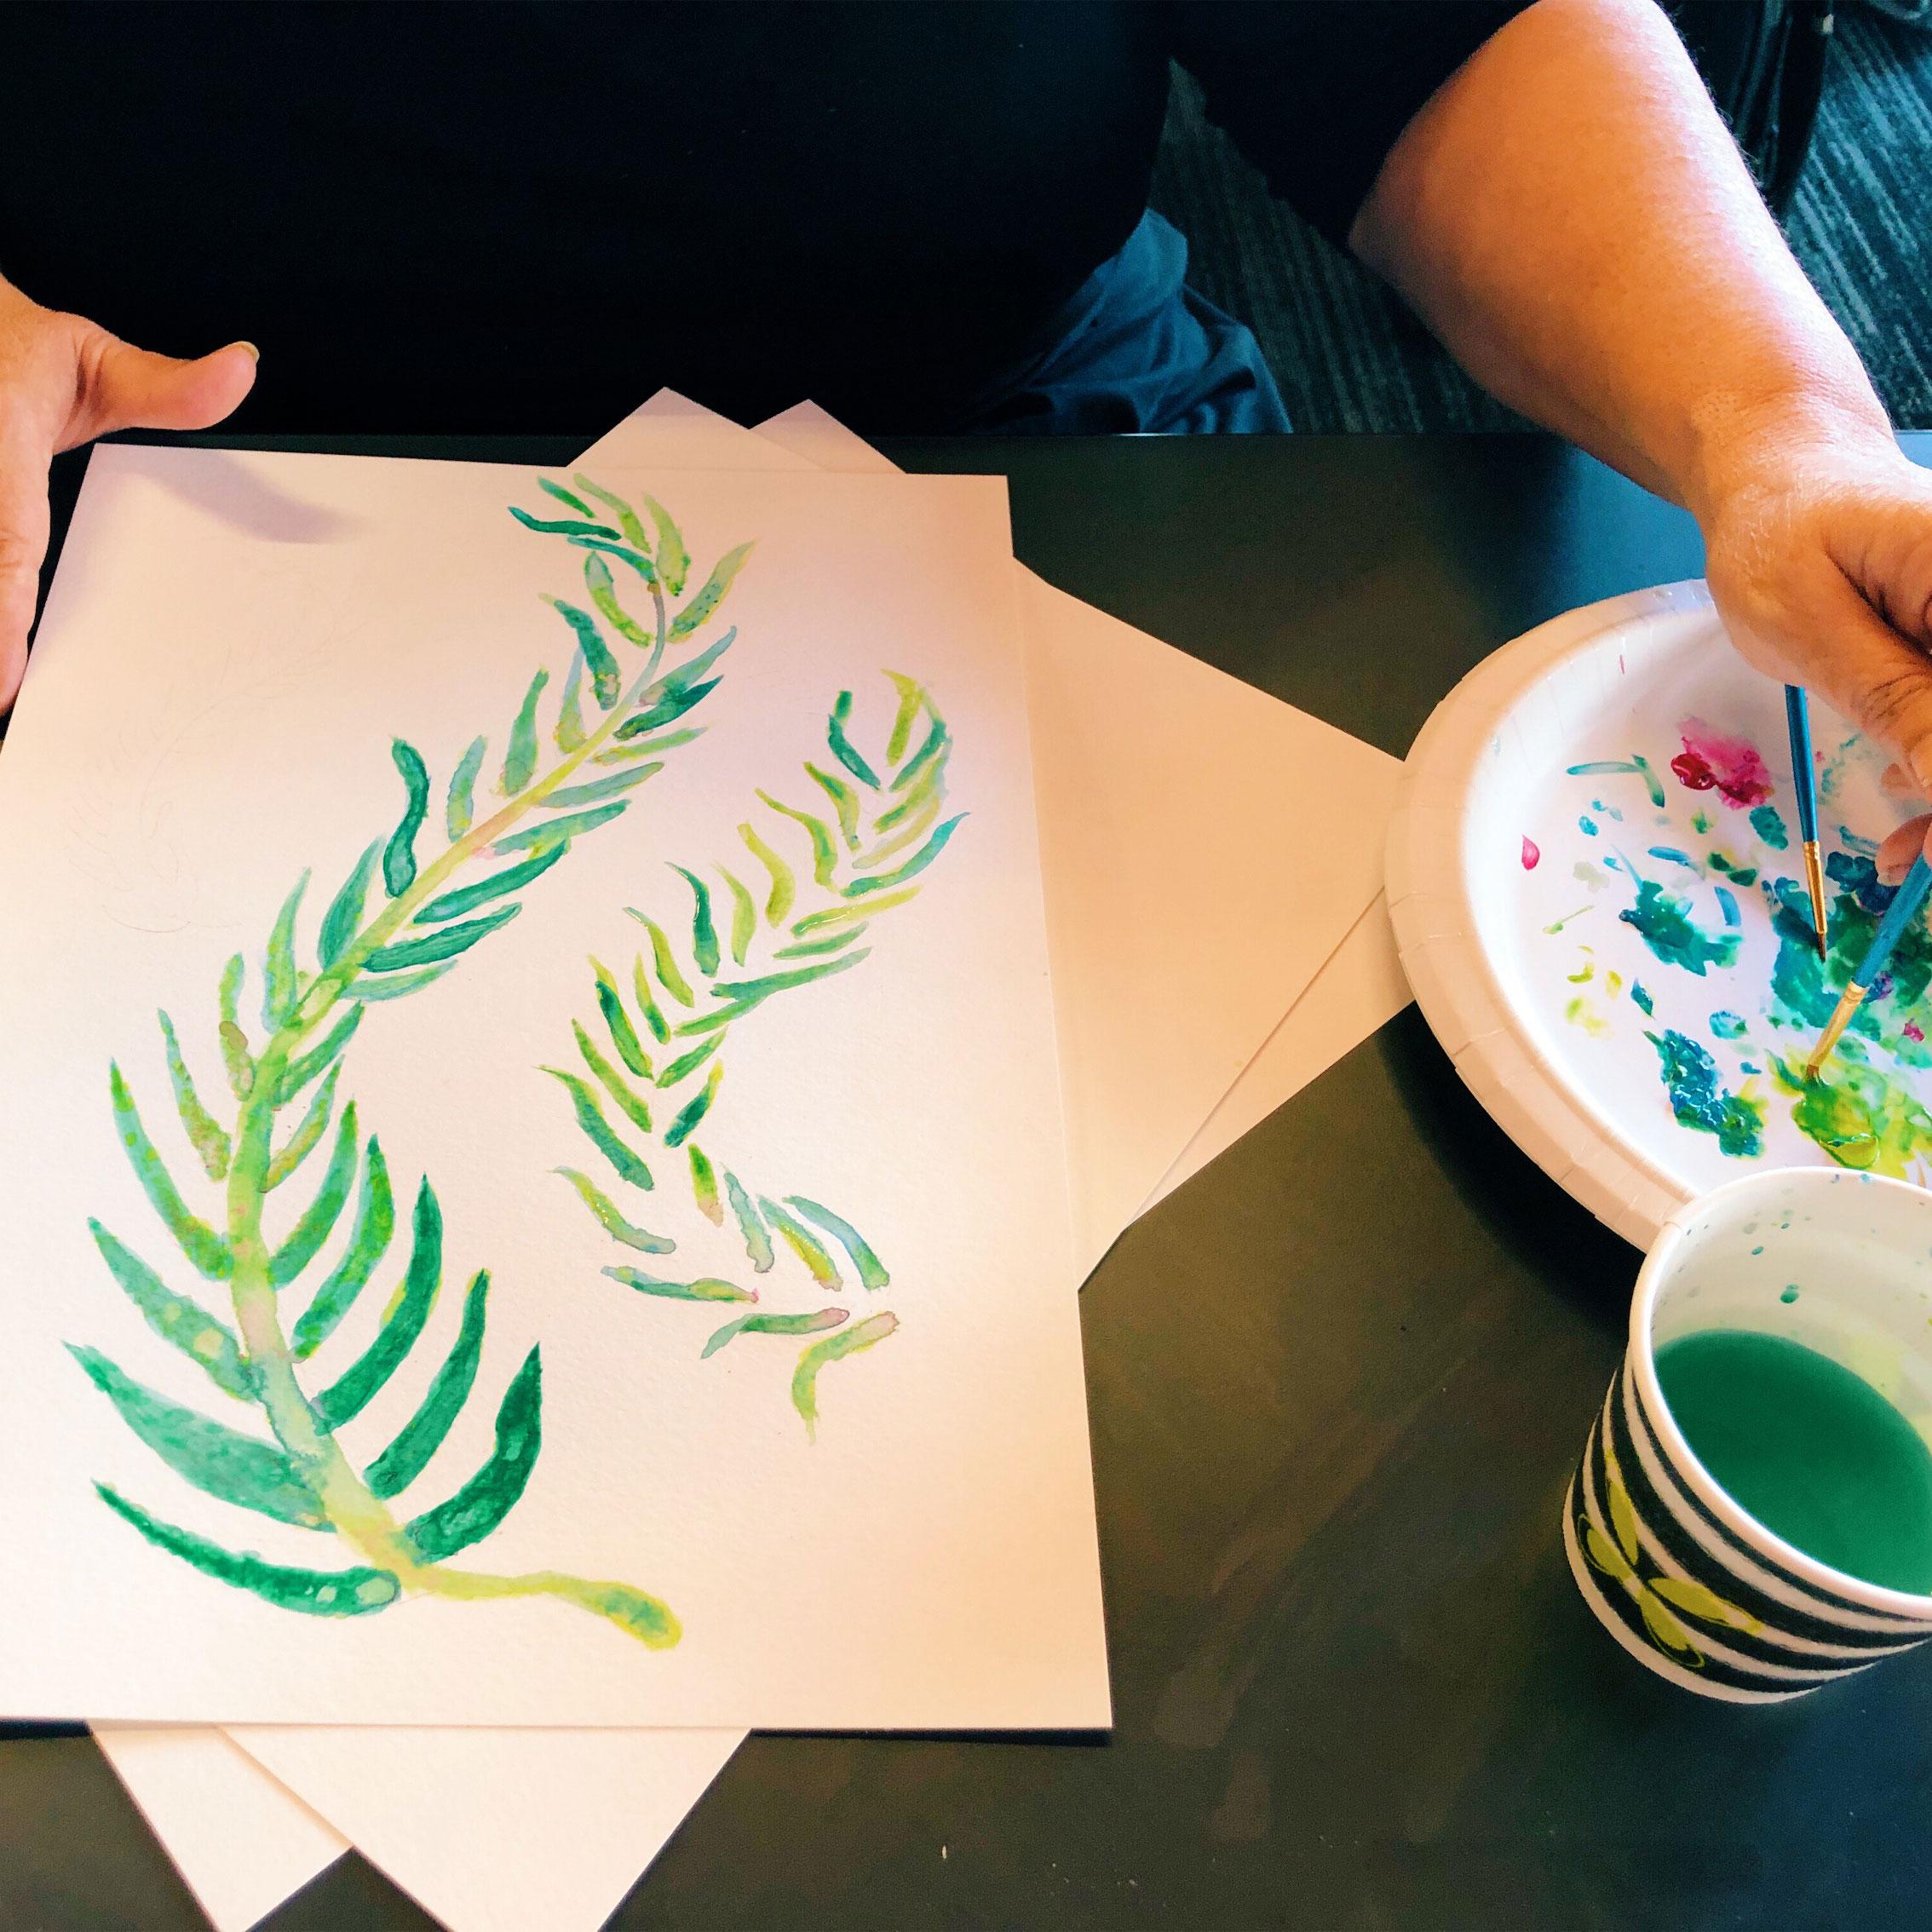 WatercolorWorkshopCatCoq-5.jpg